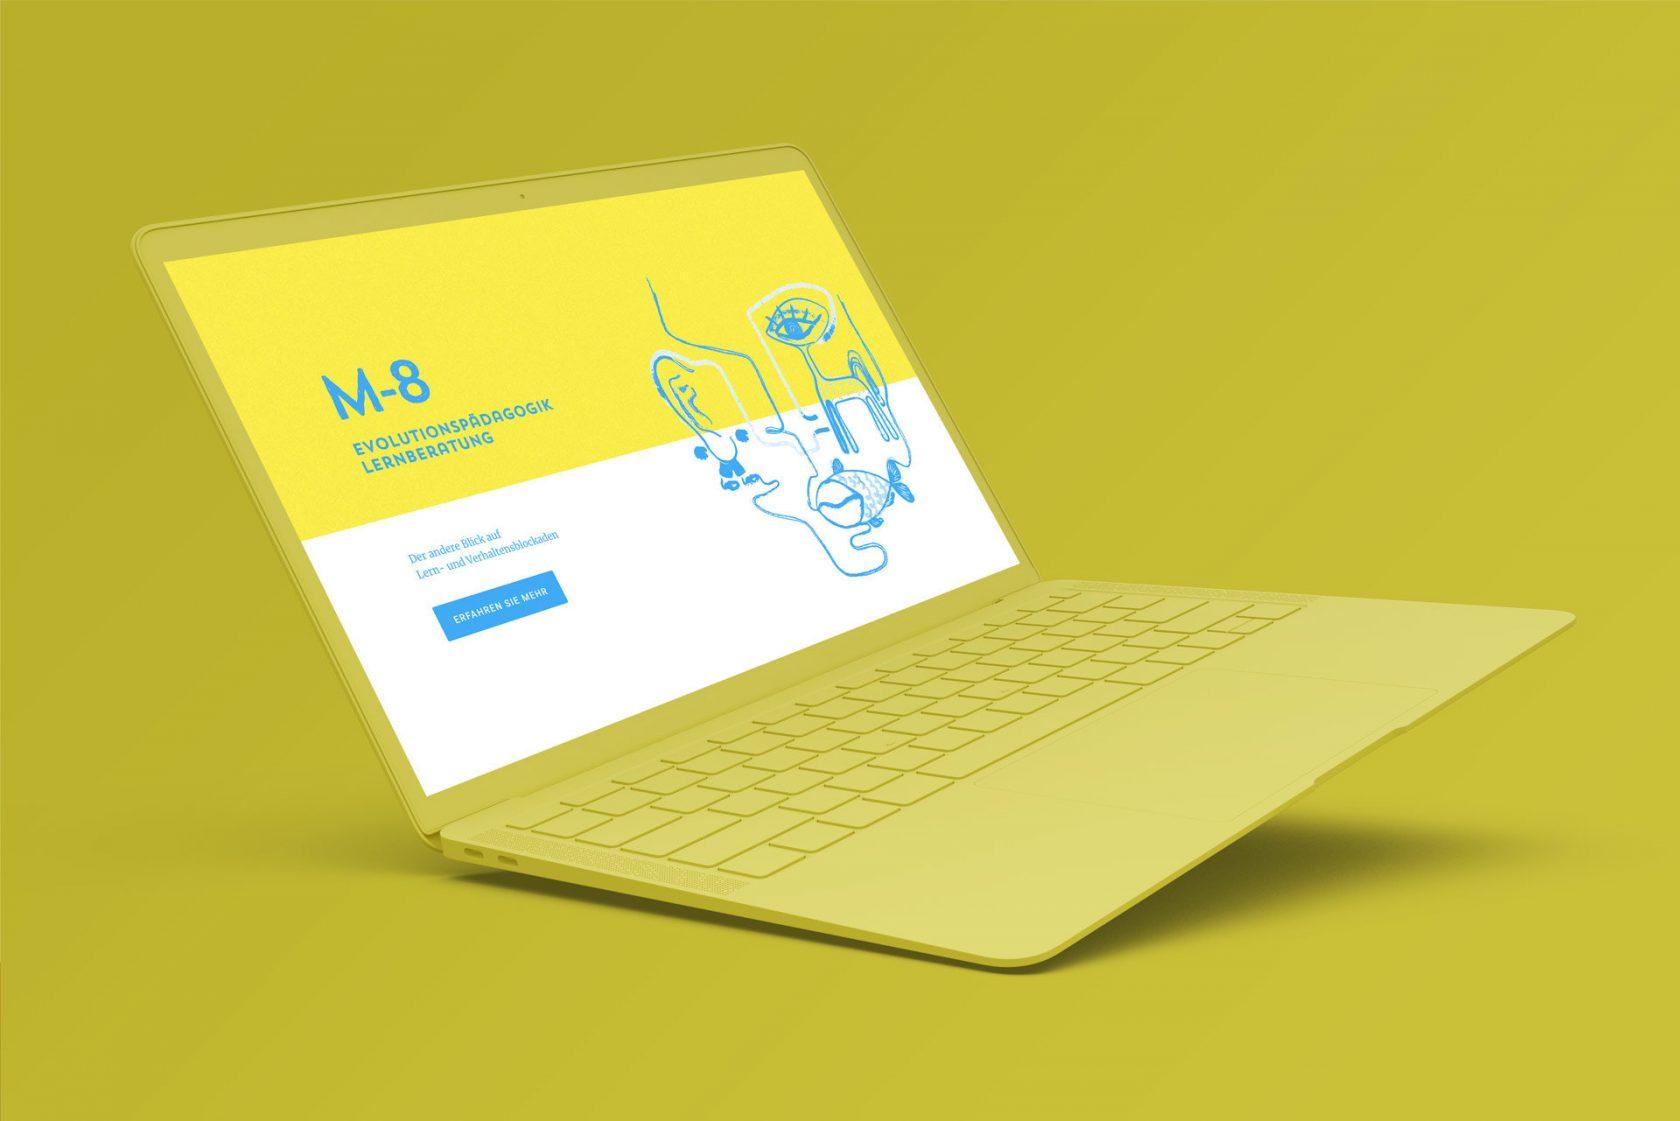 projekte_m-8-evolutionspaedagogik-website